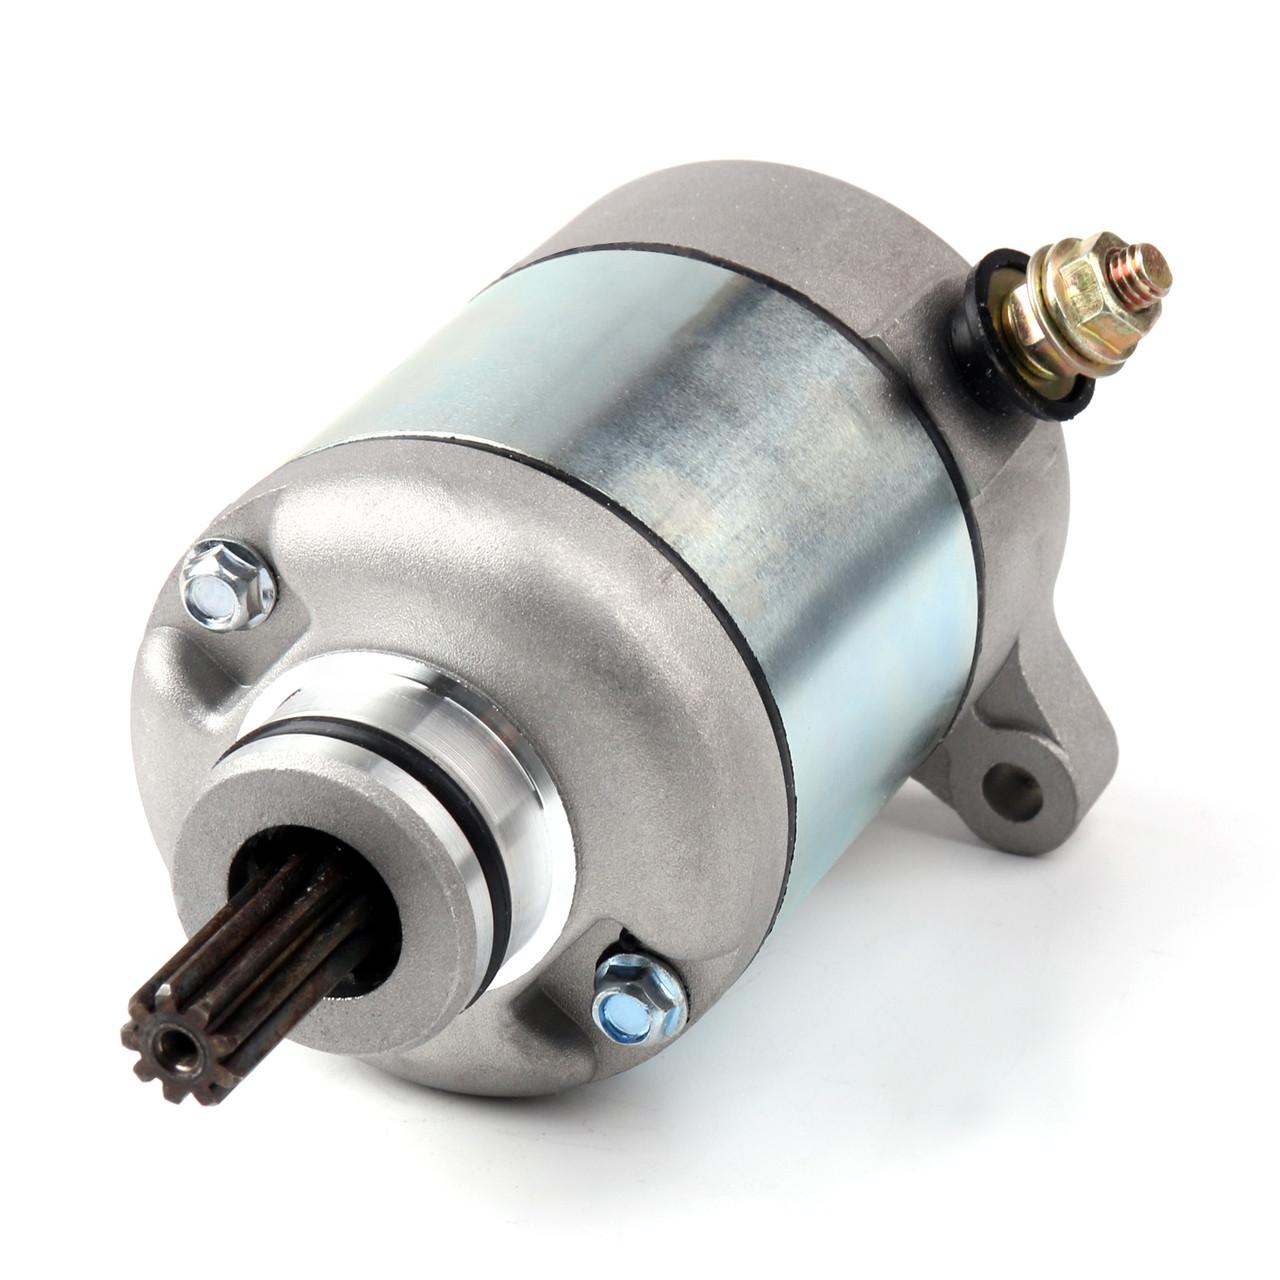 Motor Starter For Honda CBR125R 2004-2010 RS 2005-2006 RW 2005-2010 CBR150R Silver